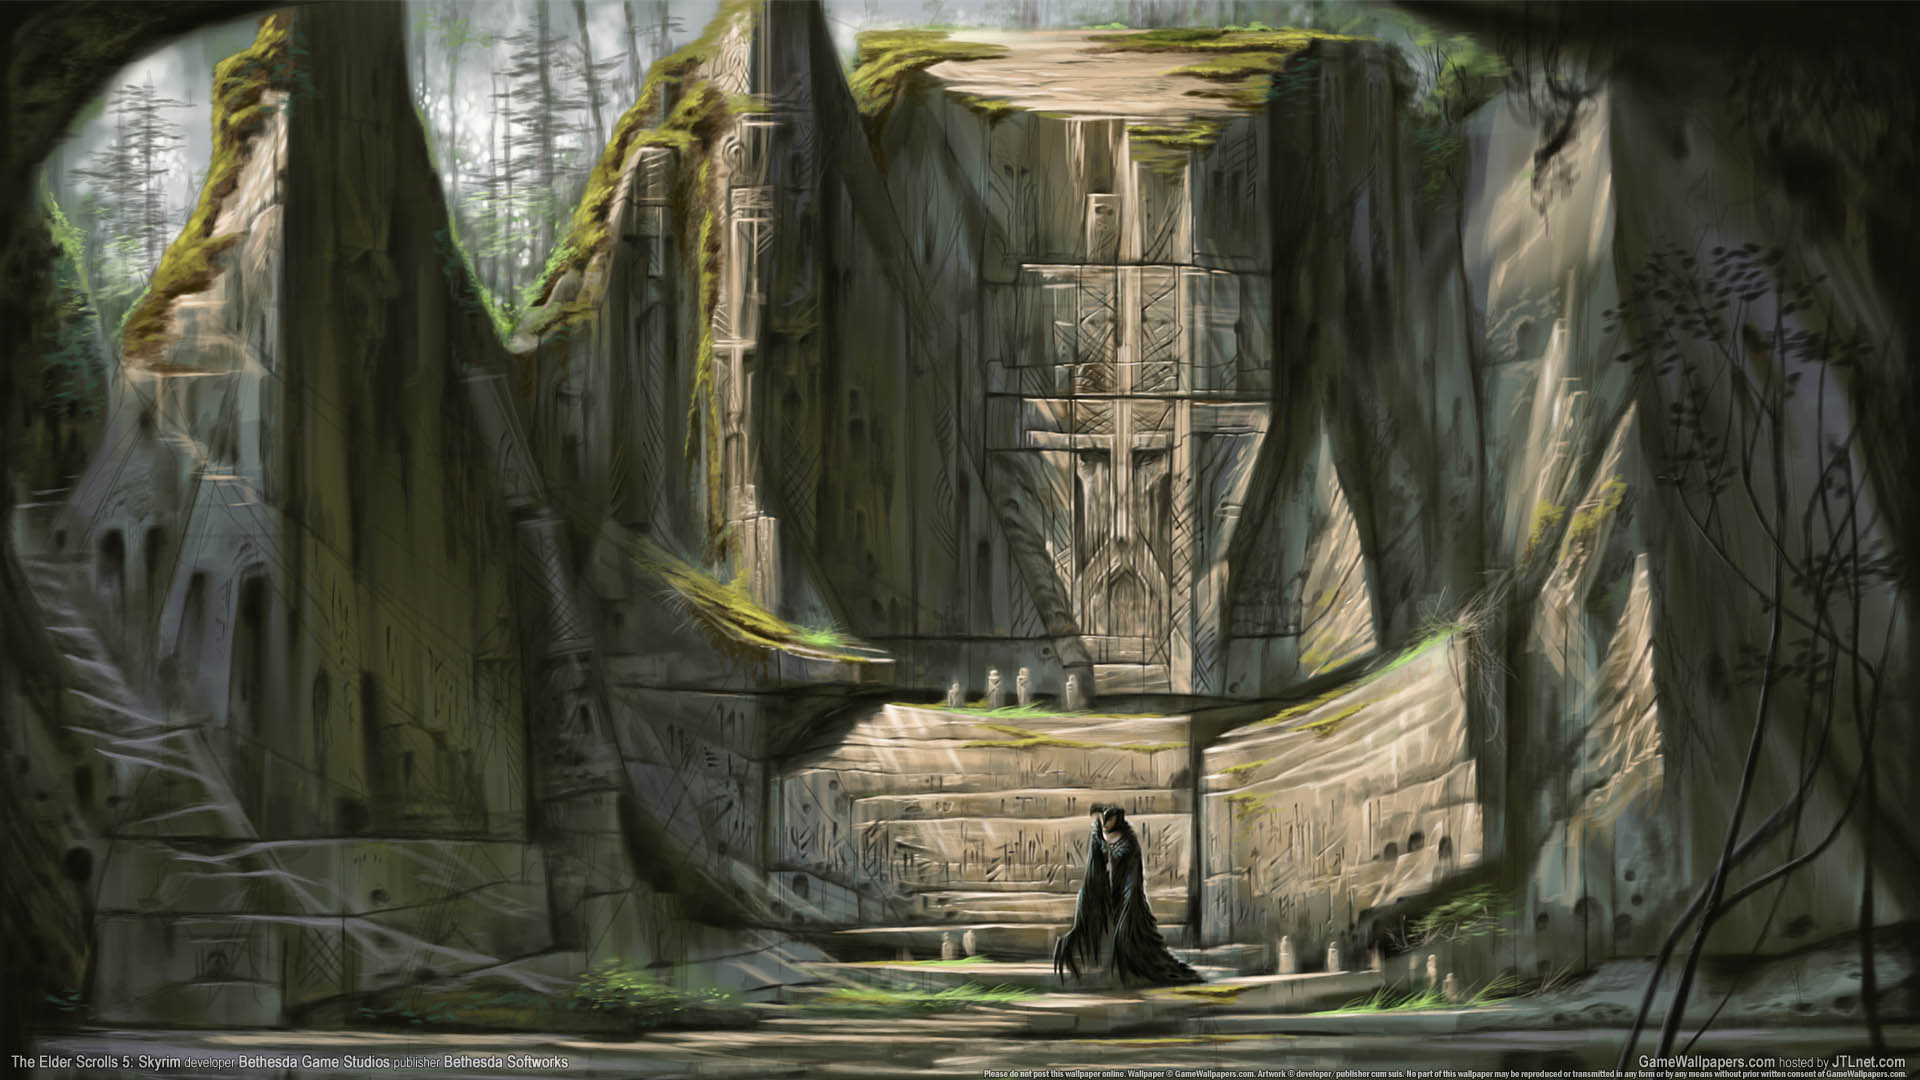 The Elder Scrolls 5: Skyrim Hintergrundbild 01 1920x1080